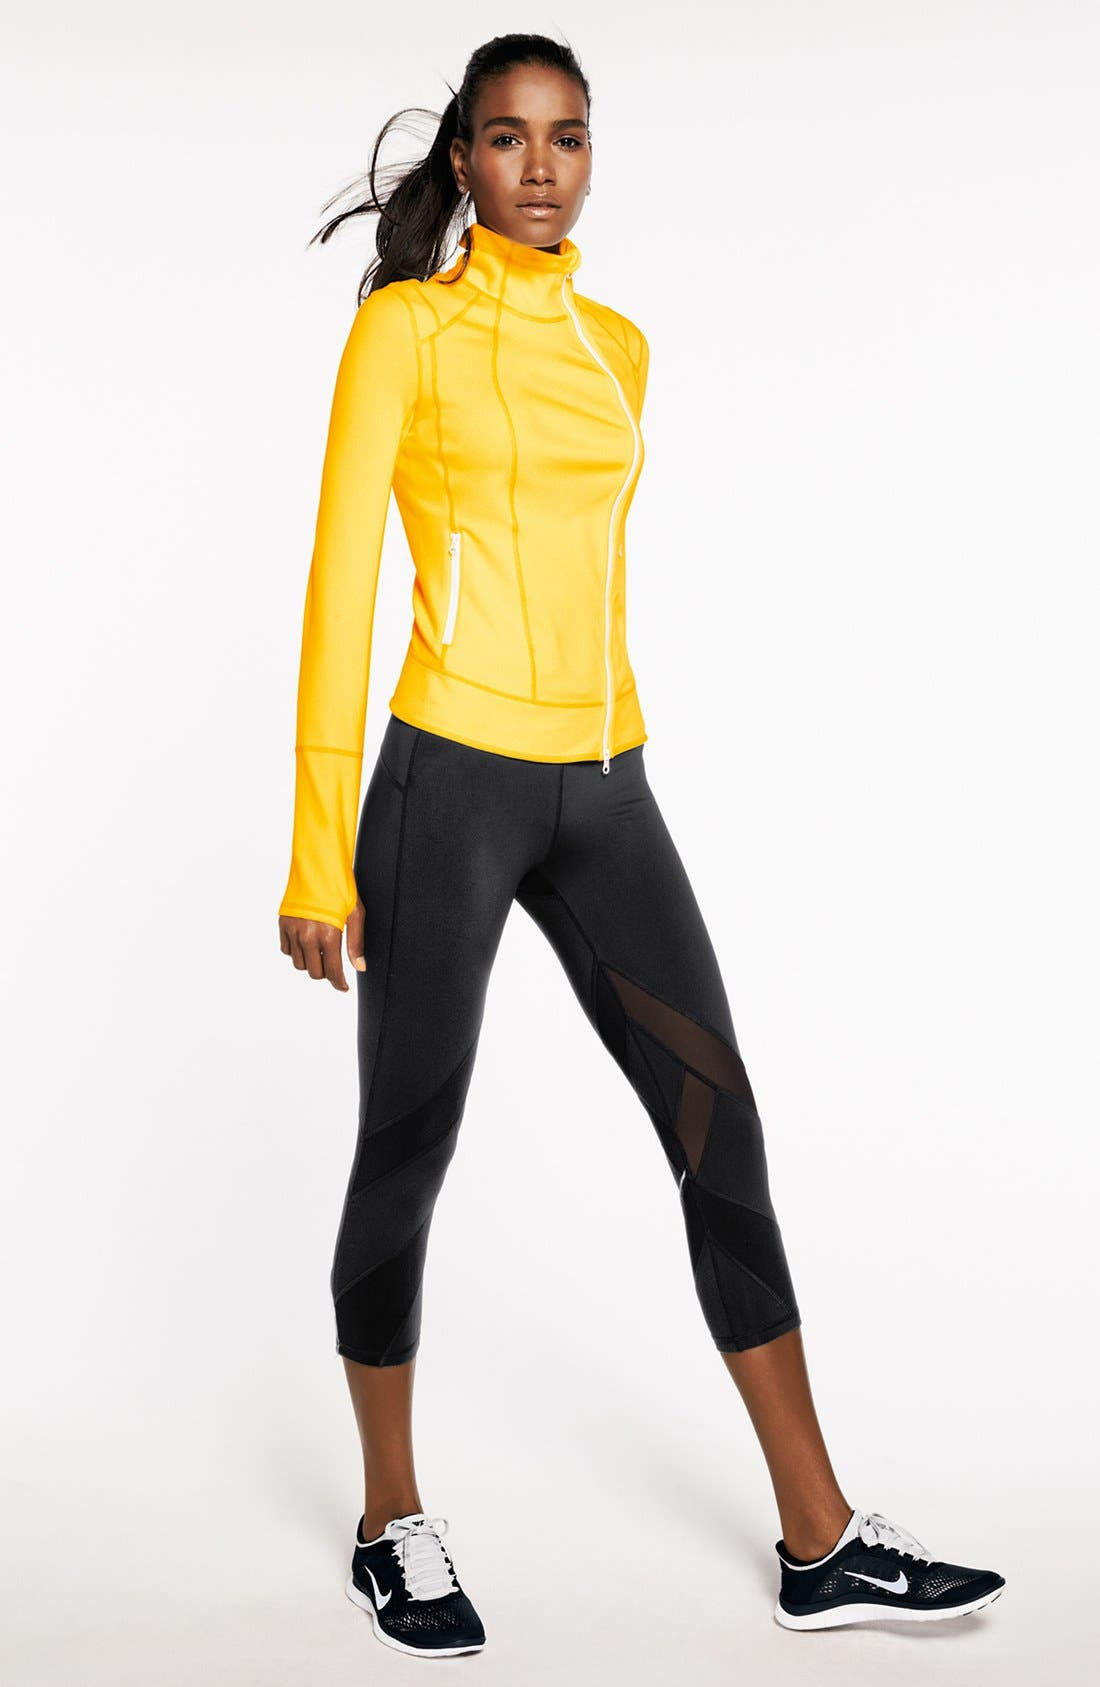 Alternate Image 1 Selected - Zella Jacket & Crop Pants